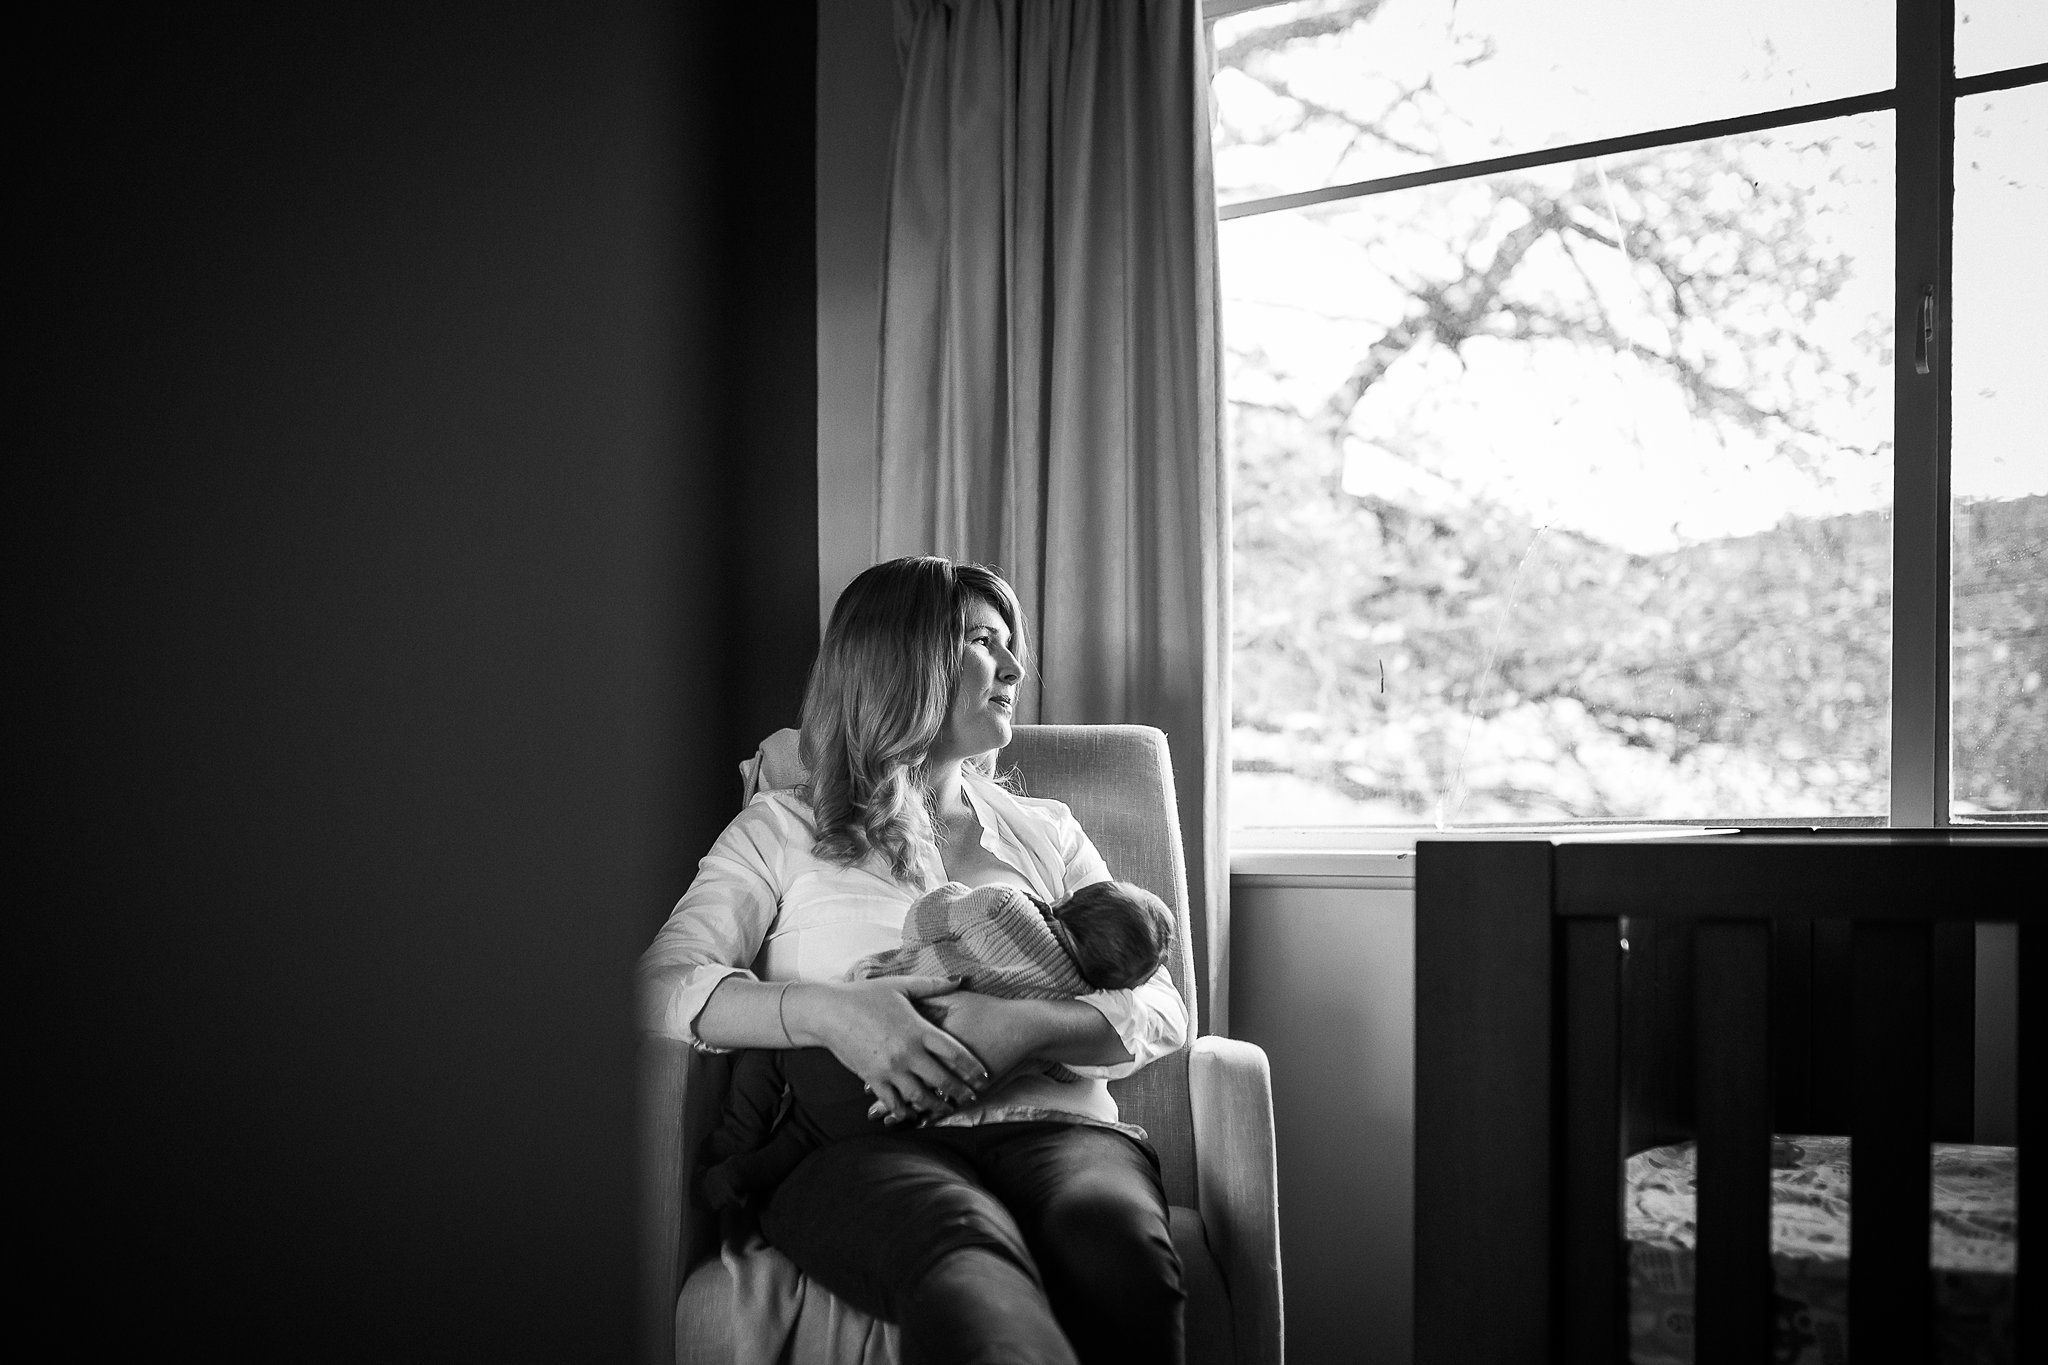 newborn-baby-in-home-family-photography-albury-wodonga-north-east-victoria (5).jpg